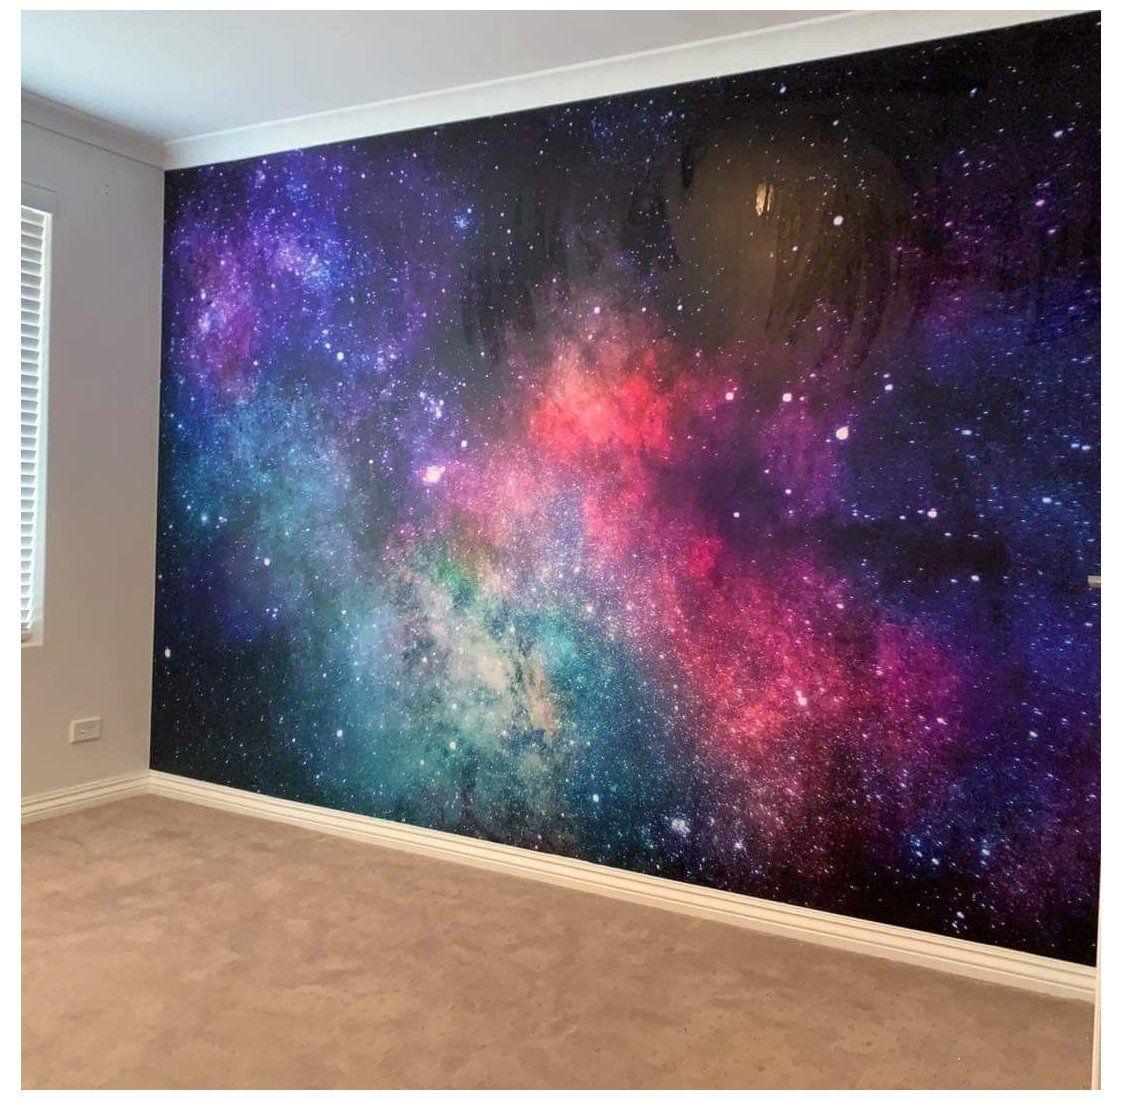 Galaxy Wall Mural Galaxywallmural Bedroom Paint Designs